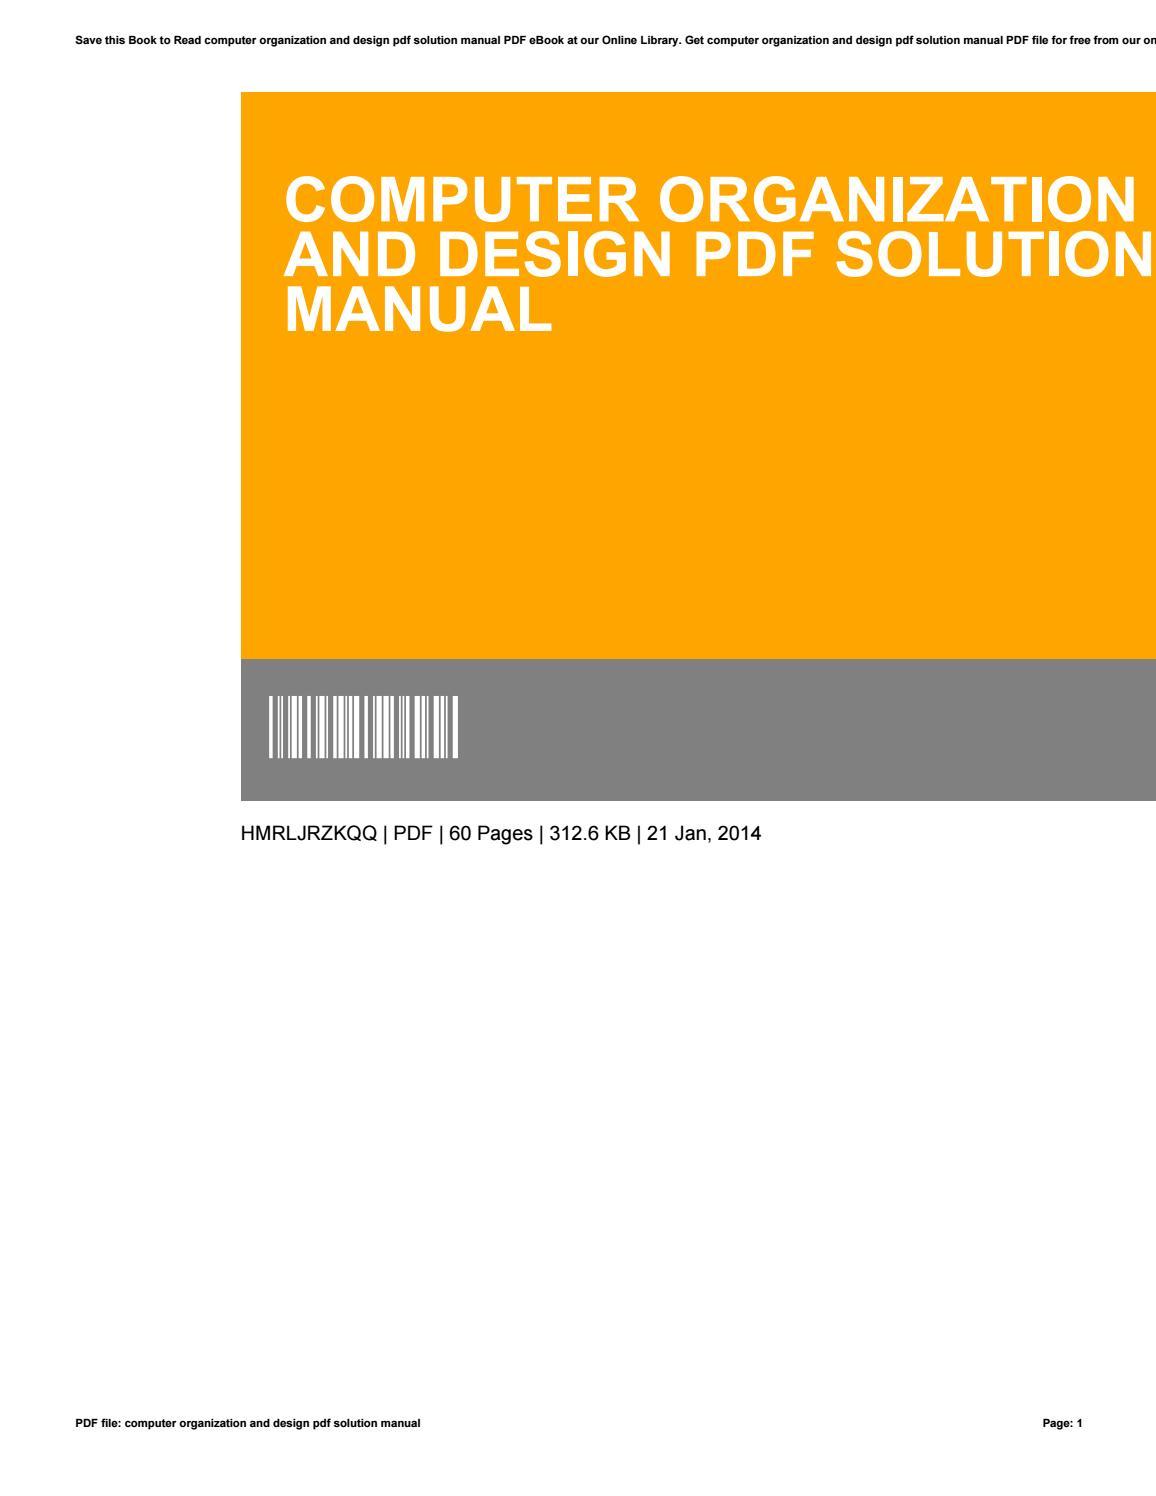 Computer Organization And Design Pdf Solution Manual By Margueritehirsch4701 Issuu